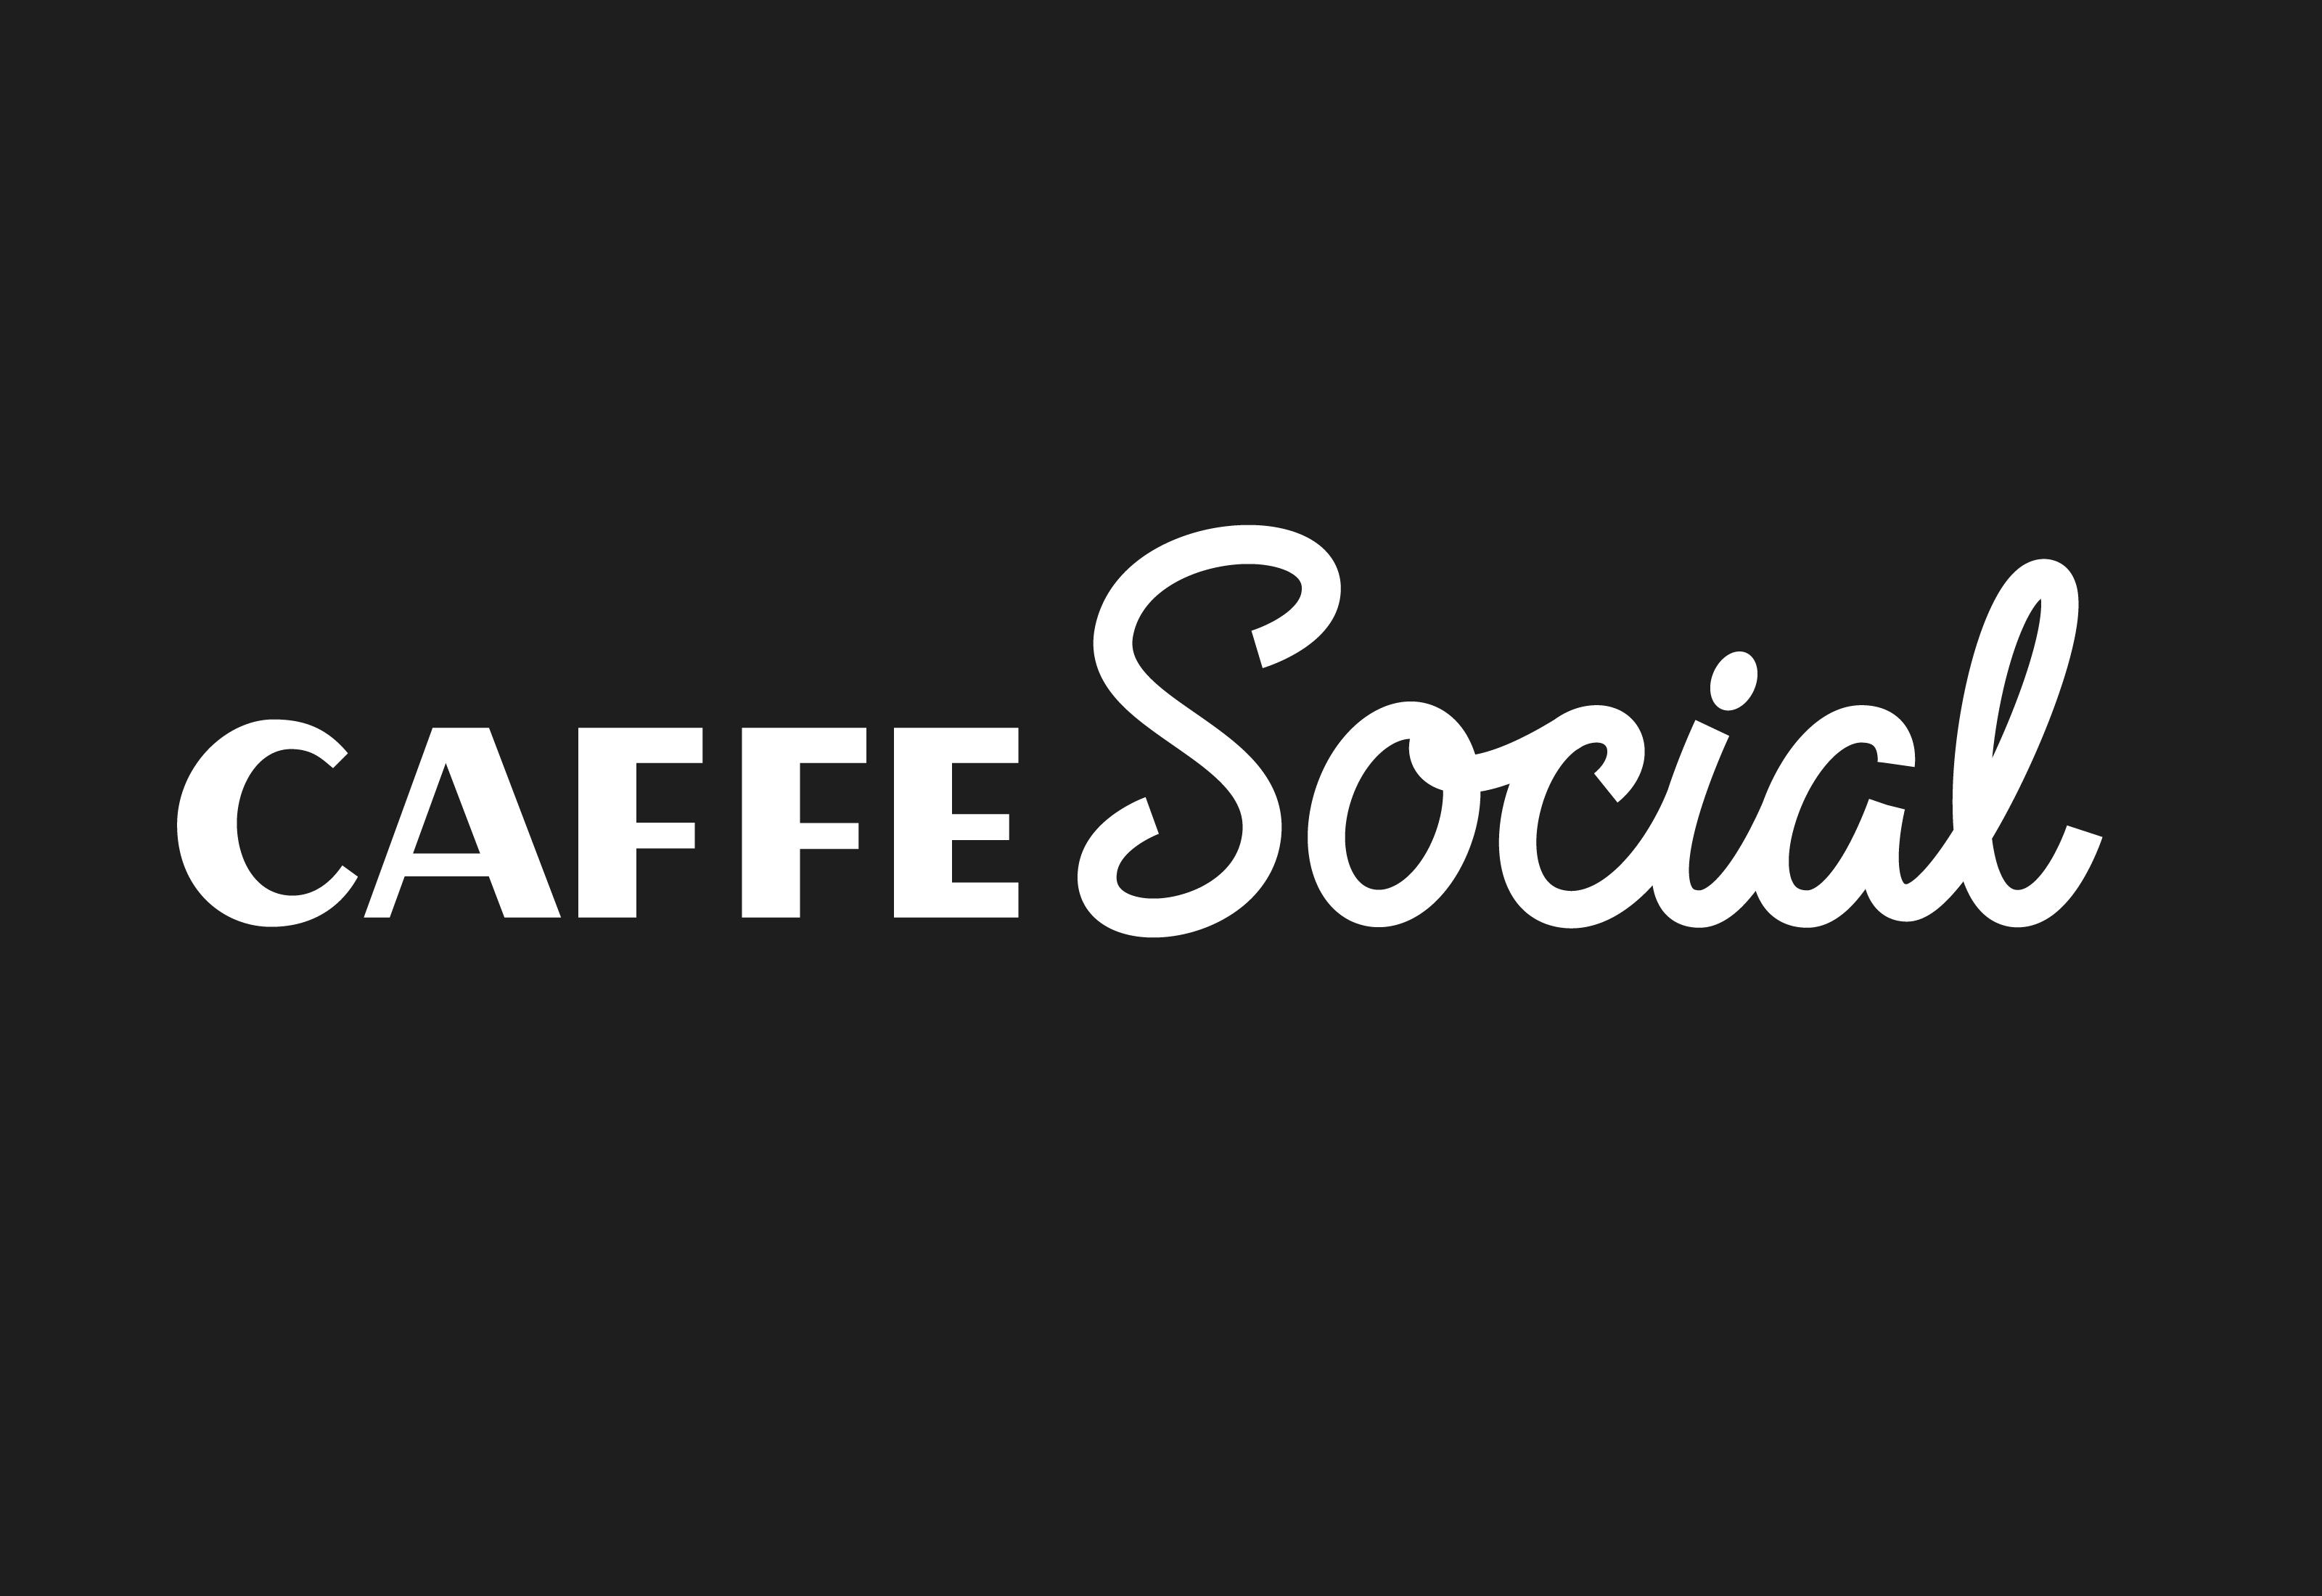 Caffe-Social-2-3200